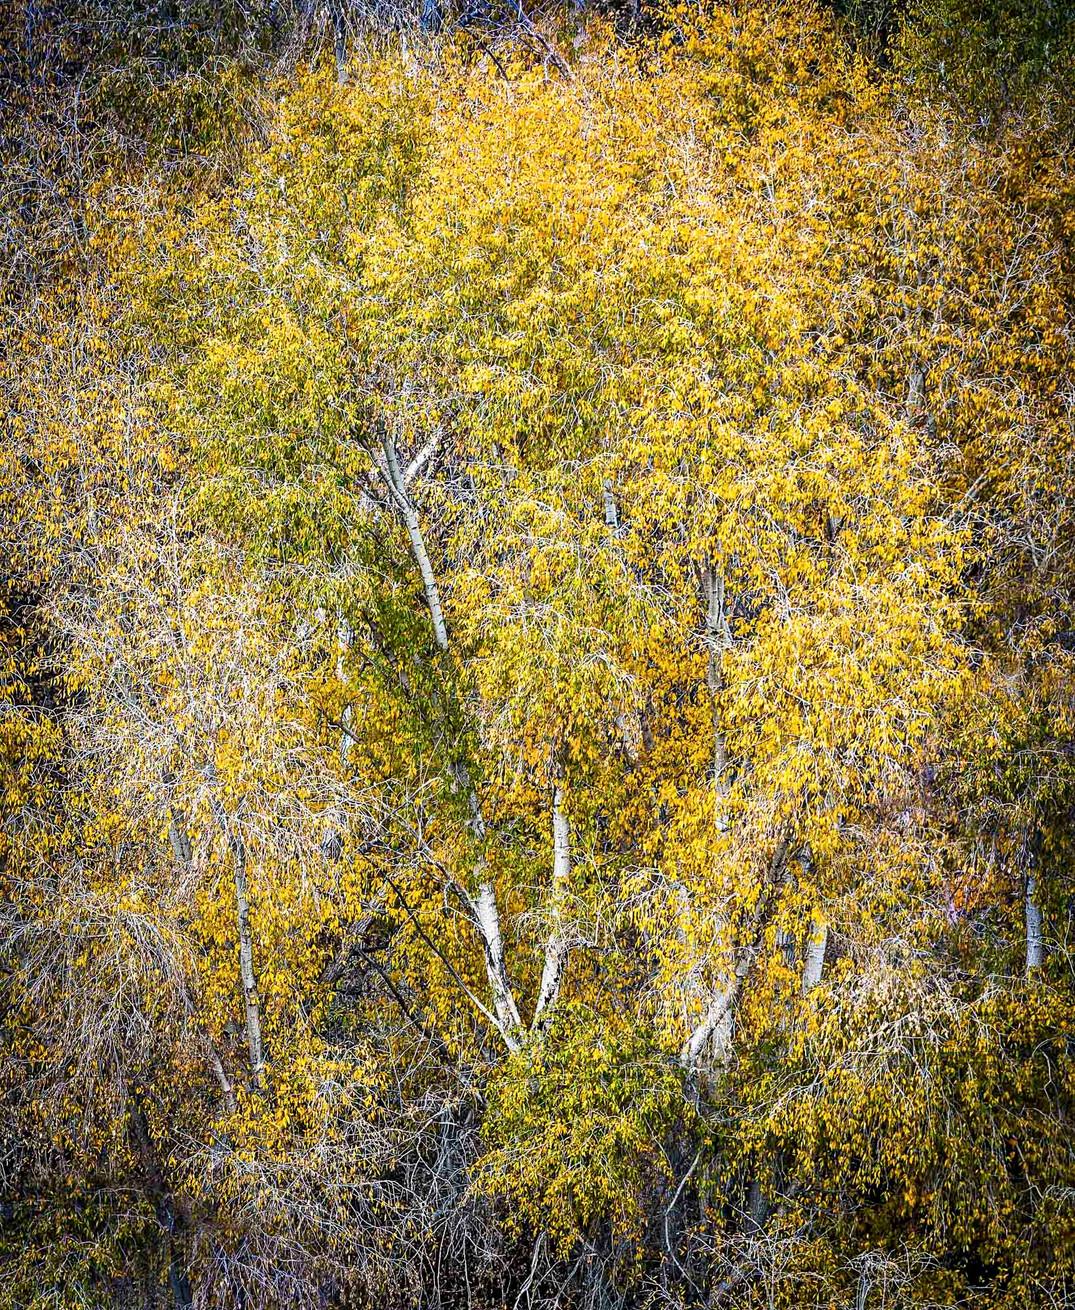 Siddho-Photography-Nature-C-7.jpg